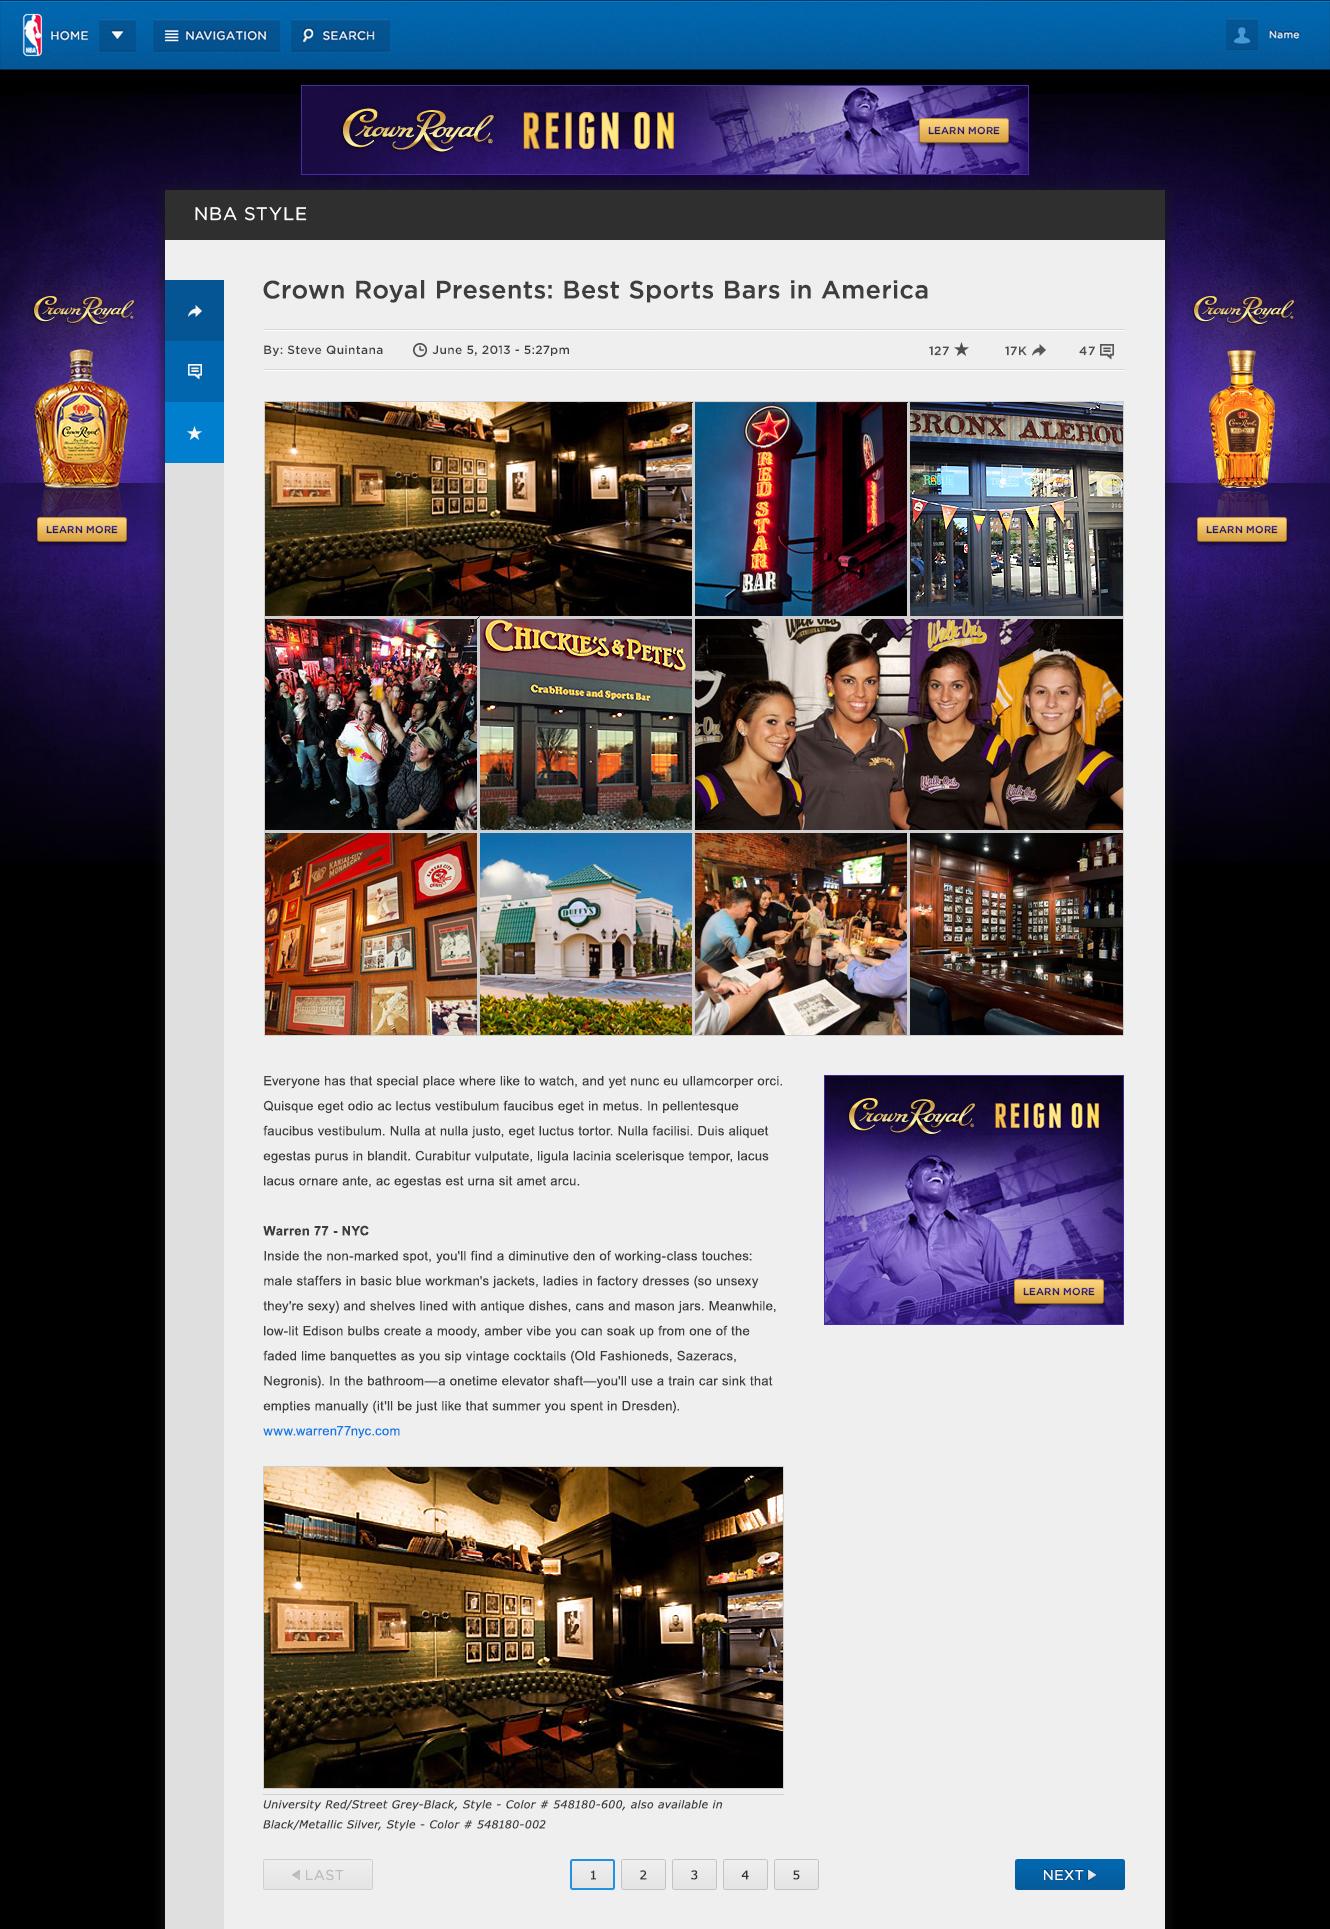 6_NBAcom_Redesign_Style_Crown_V1.jpg